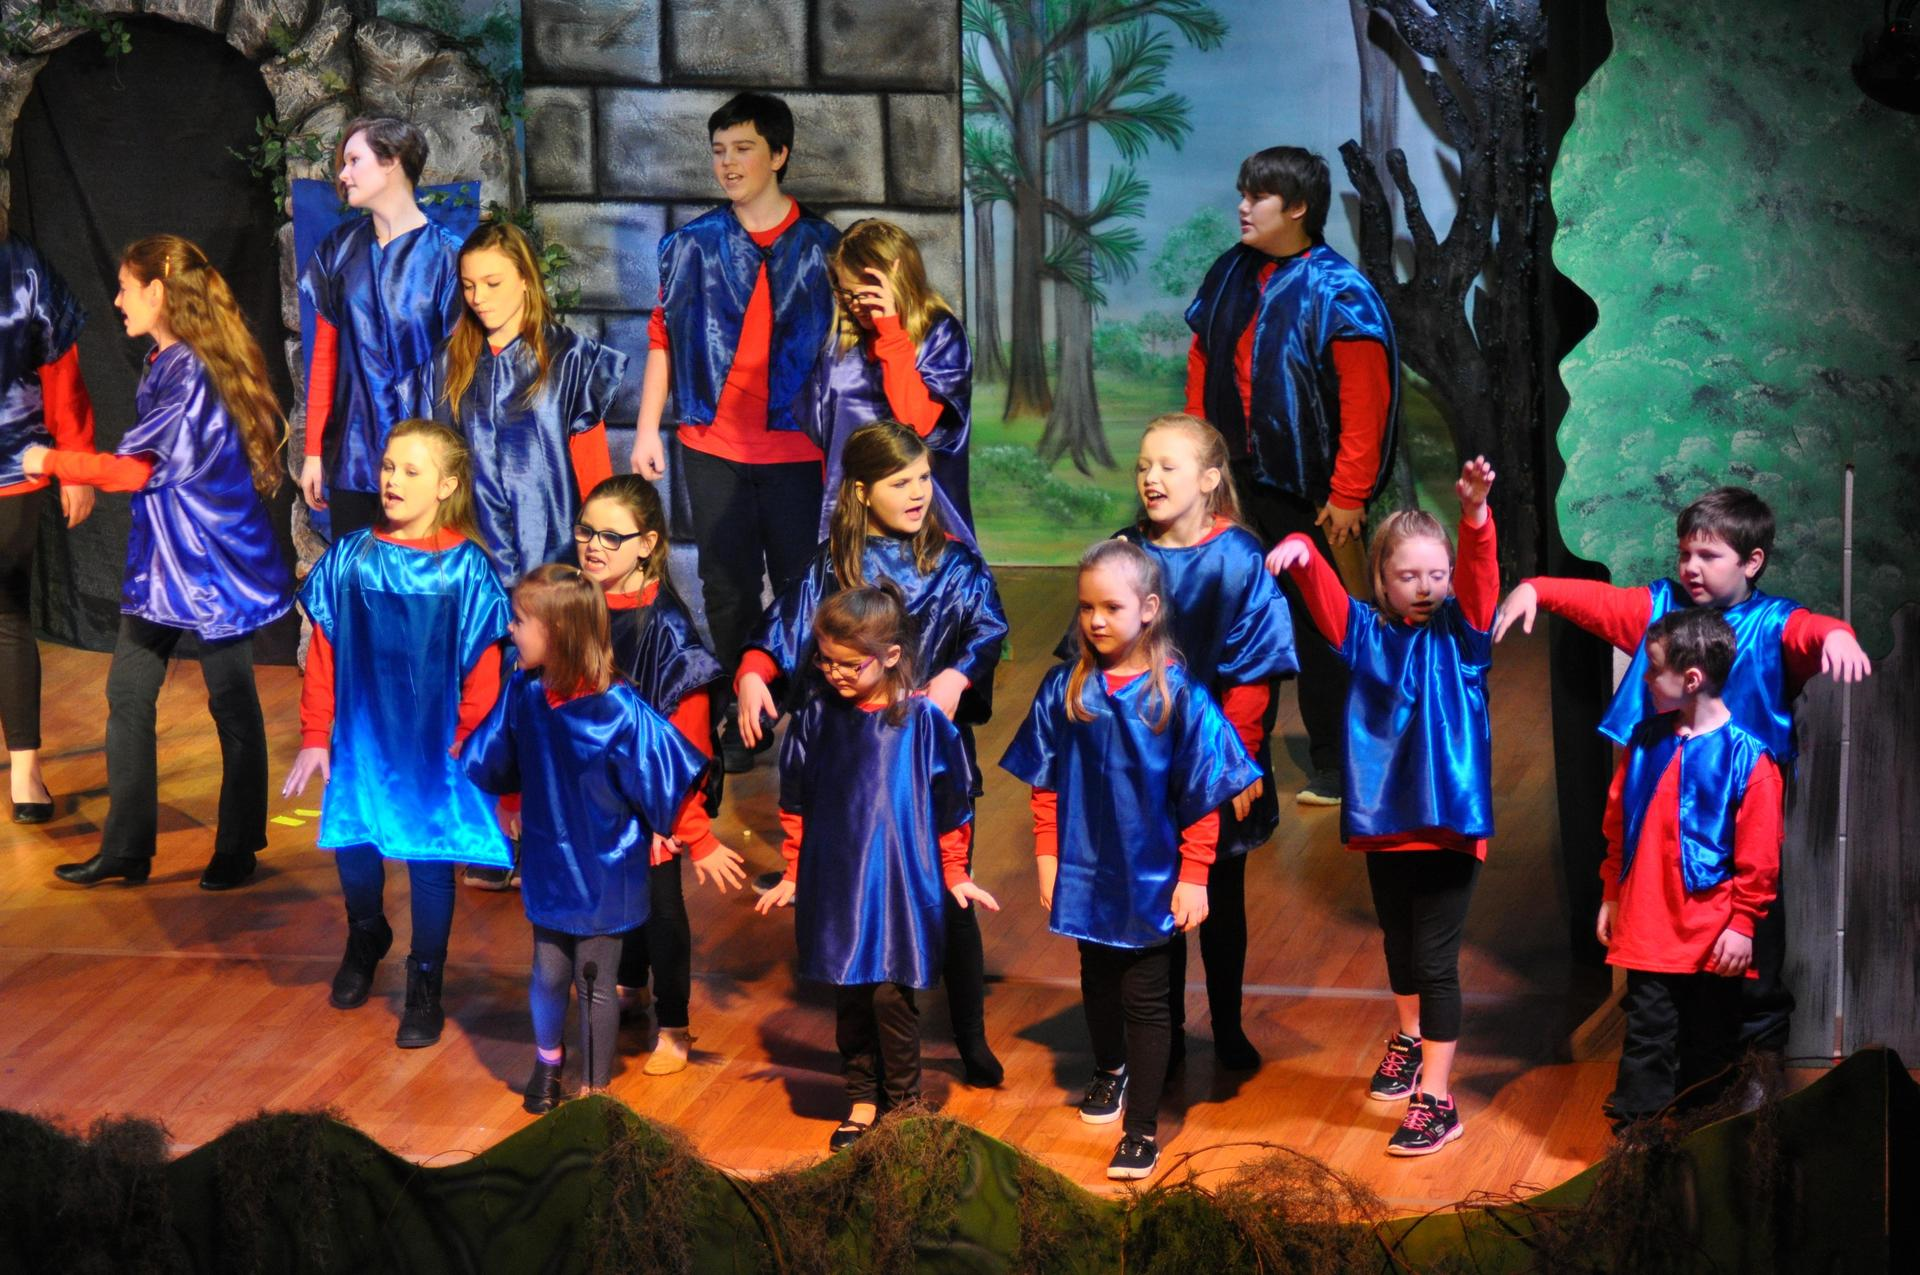 Townsfolk in Children's Theater's Production of 'Shrek The Musical Jr.' in January 2018